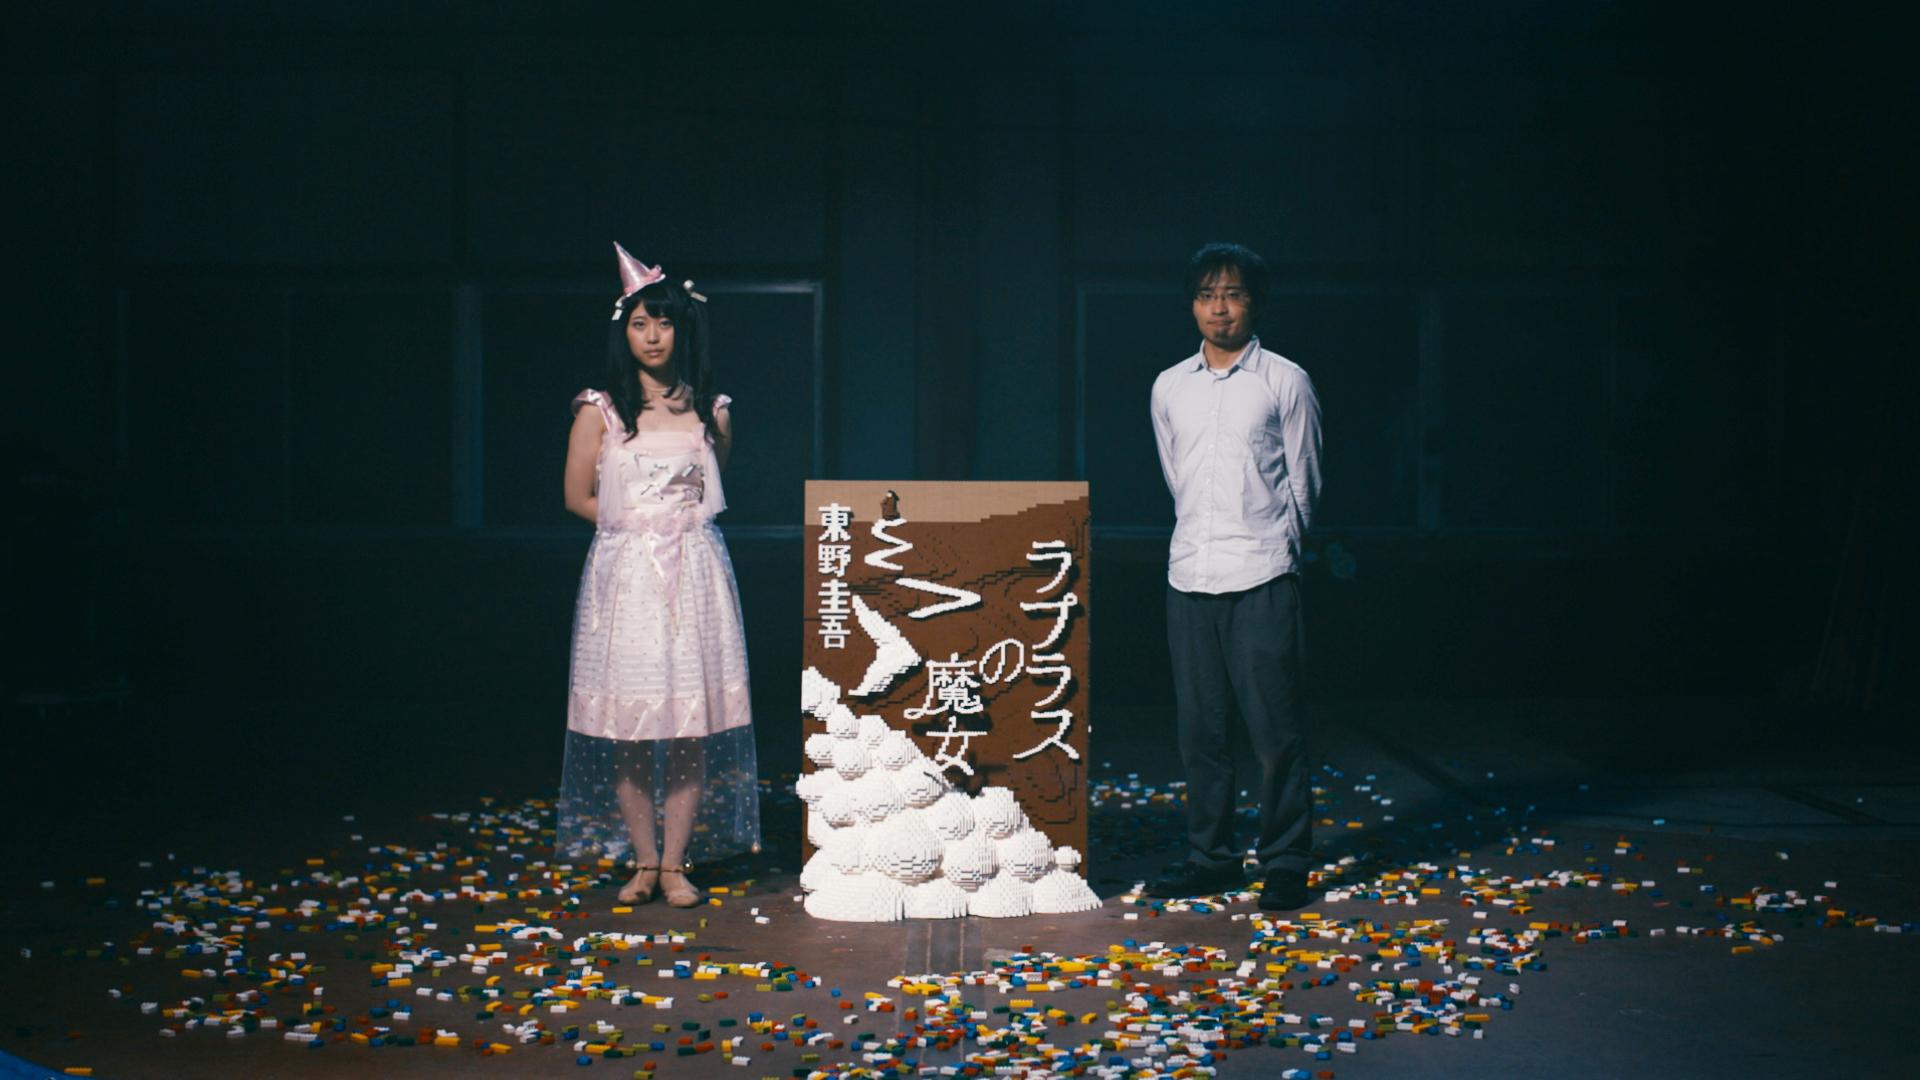 【WEBCM】東野圭吾「ラプラスの魔女」新刊プロモーションCM(2015/1min)